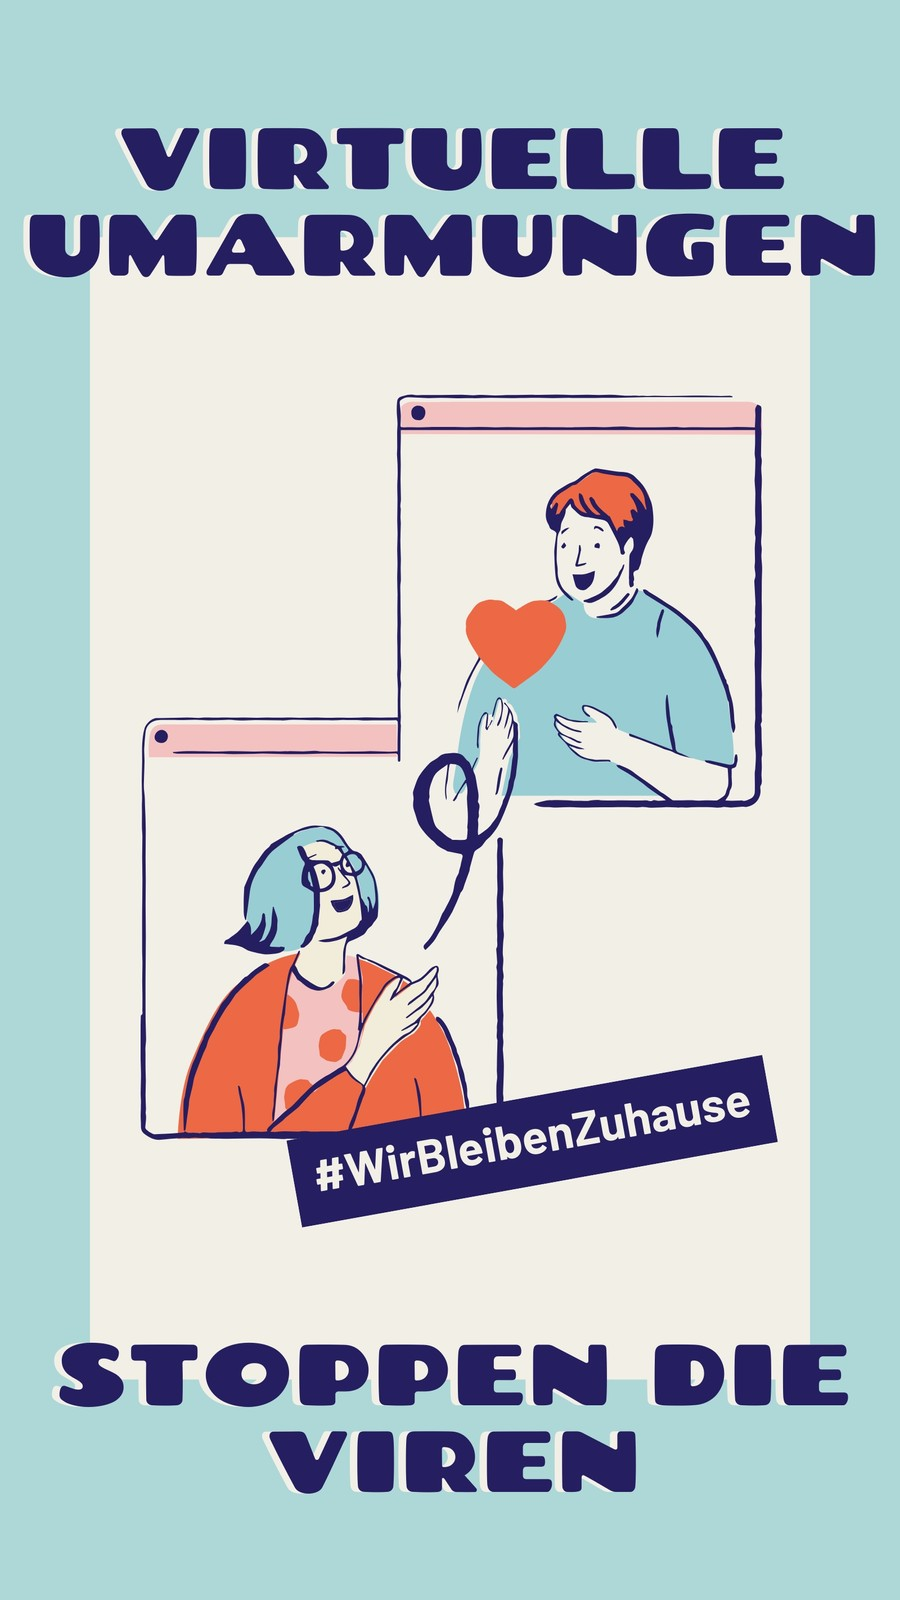 Blaue & cremefarbene Virtuelle Umarmungen & Gesundheit Instagram Story